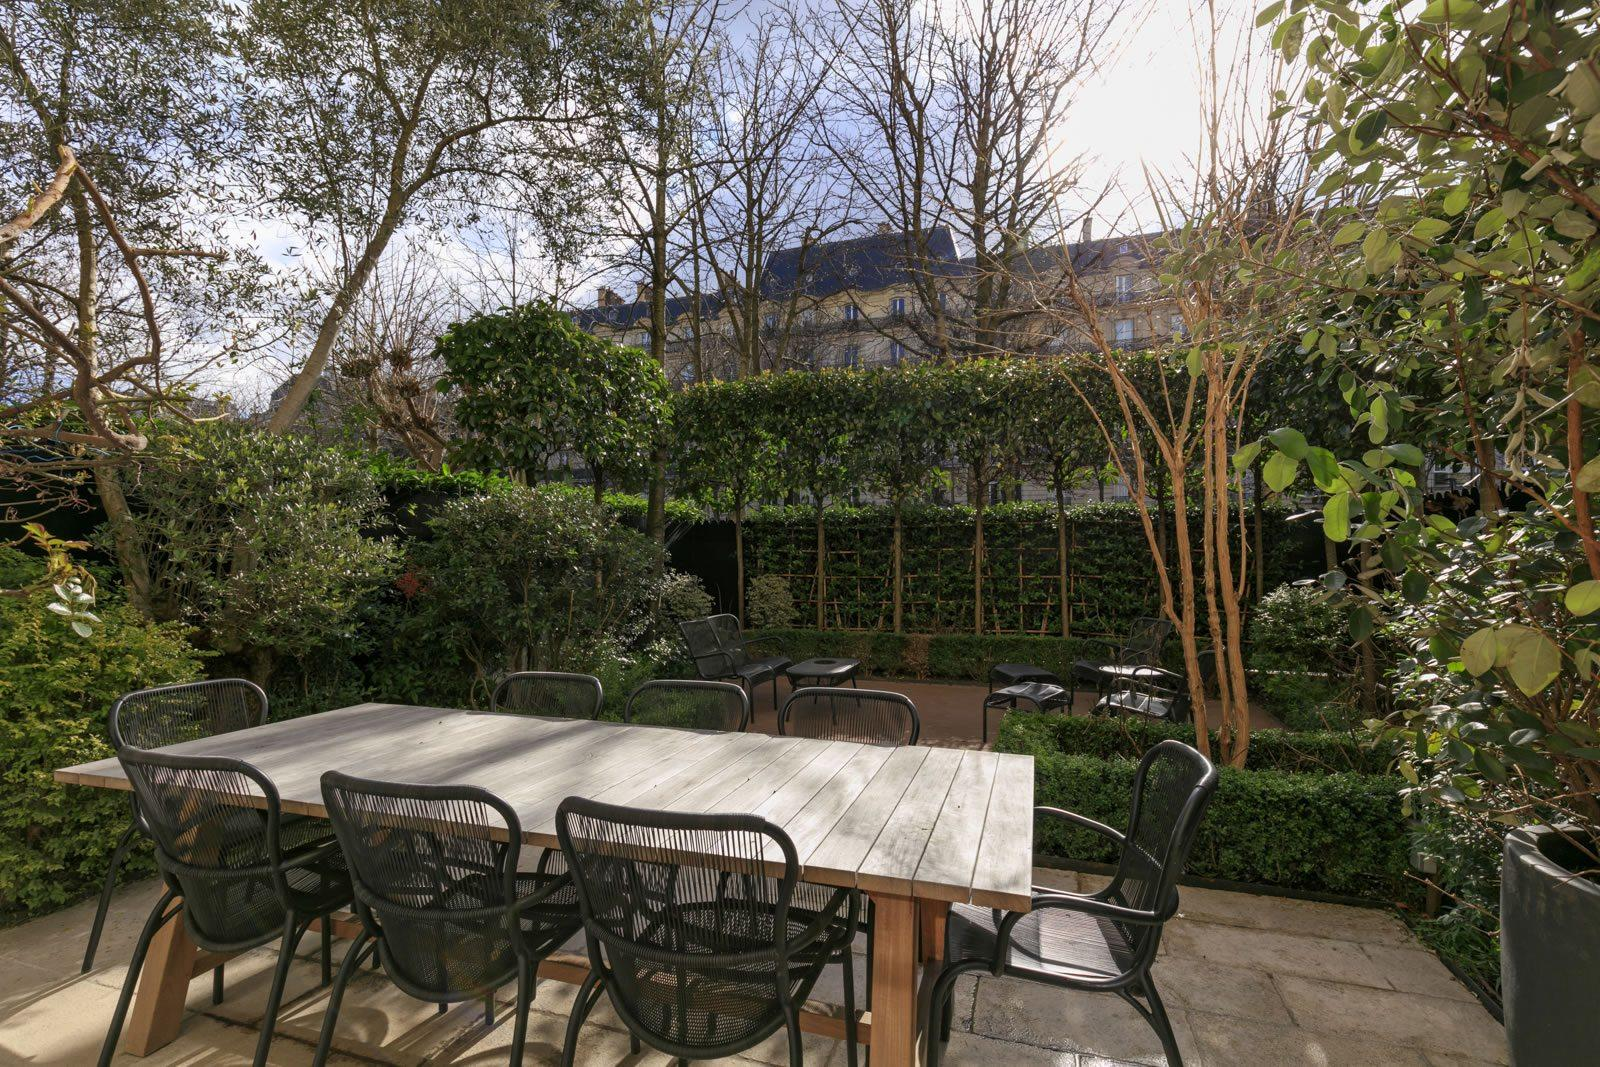 appartement-exceptionnel-a-vendre-jardin-paappartement-exceptionnel-a-vendre-jardin-paysager-amenageysager-amenage